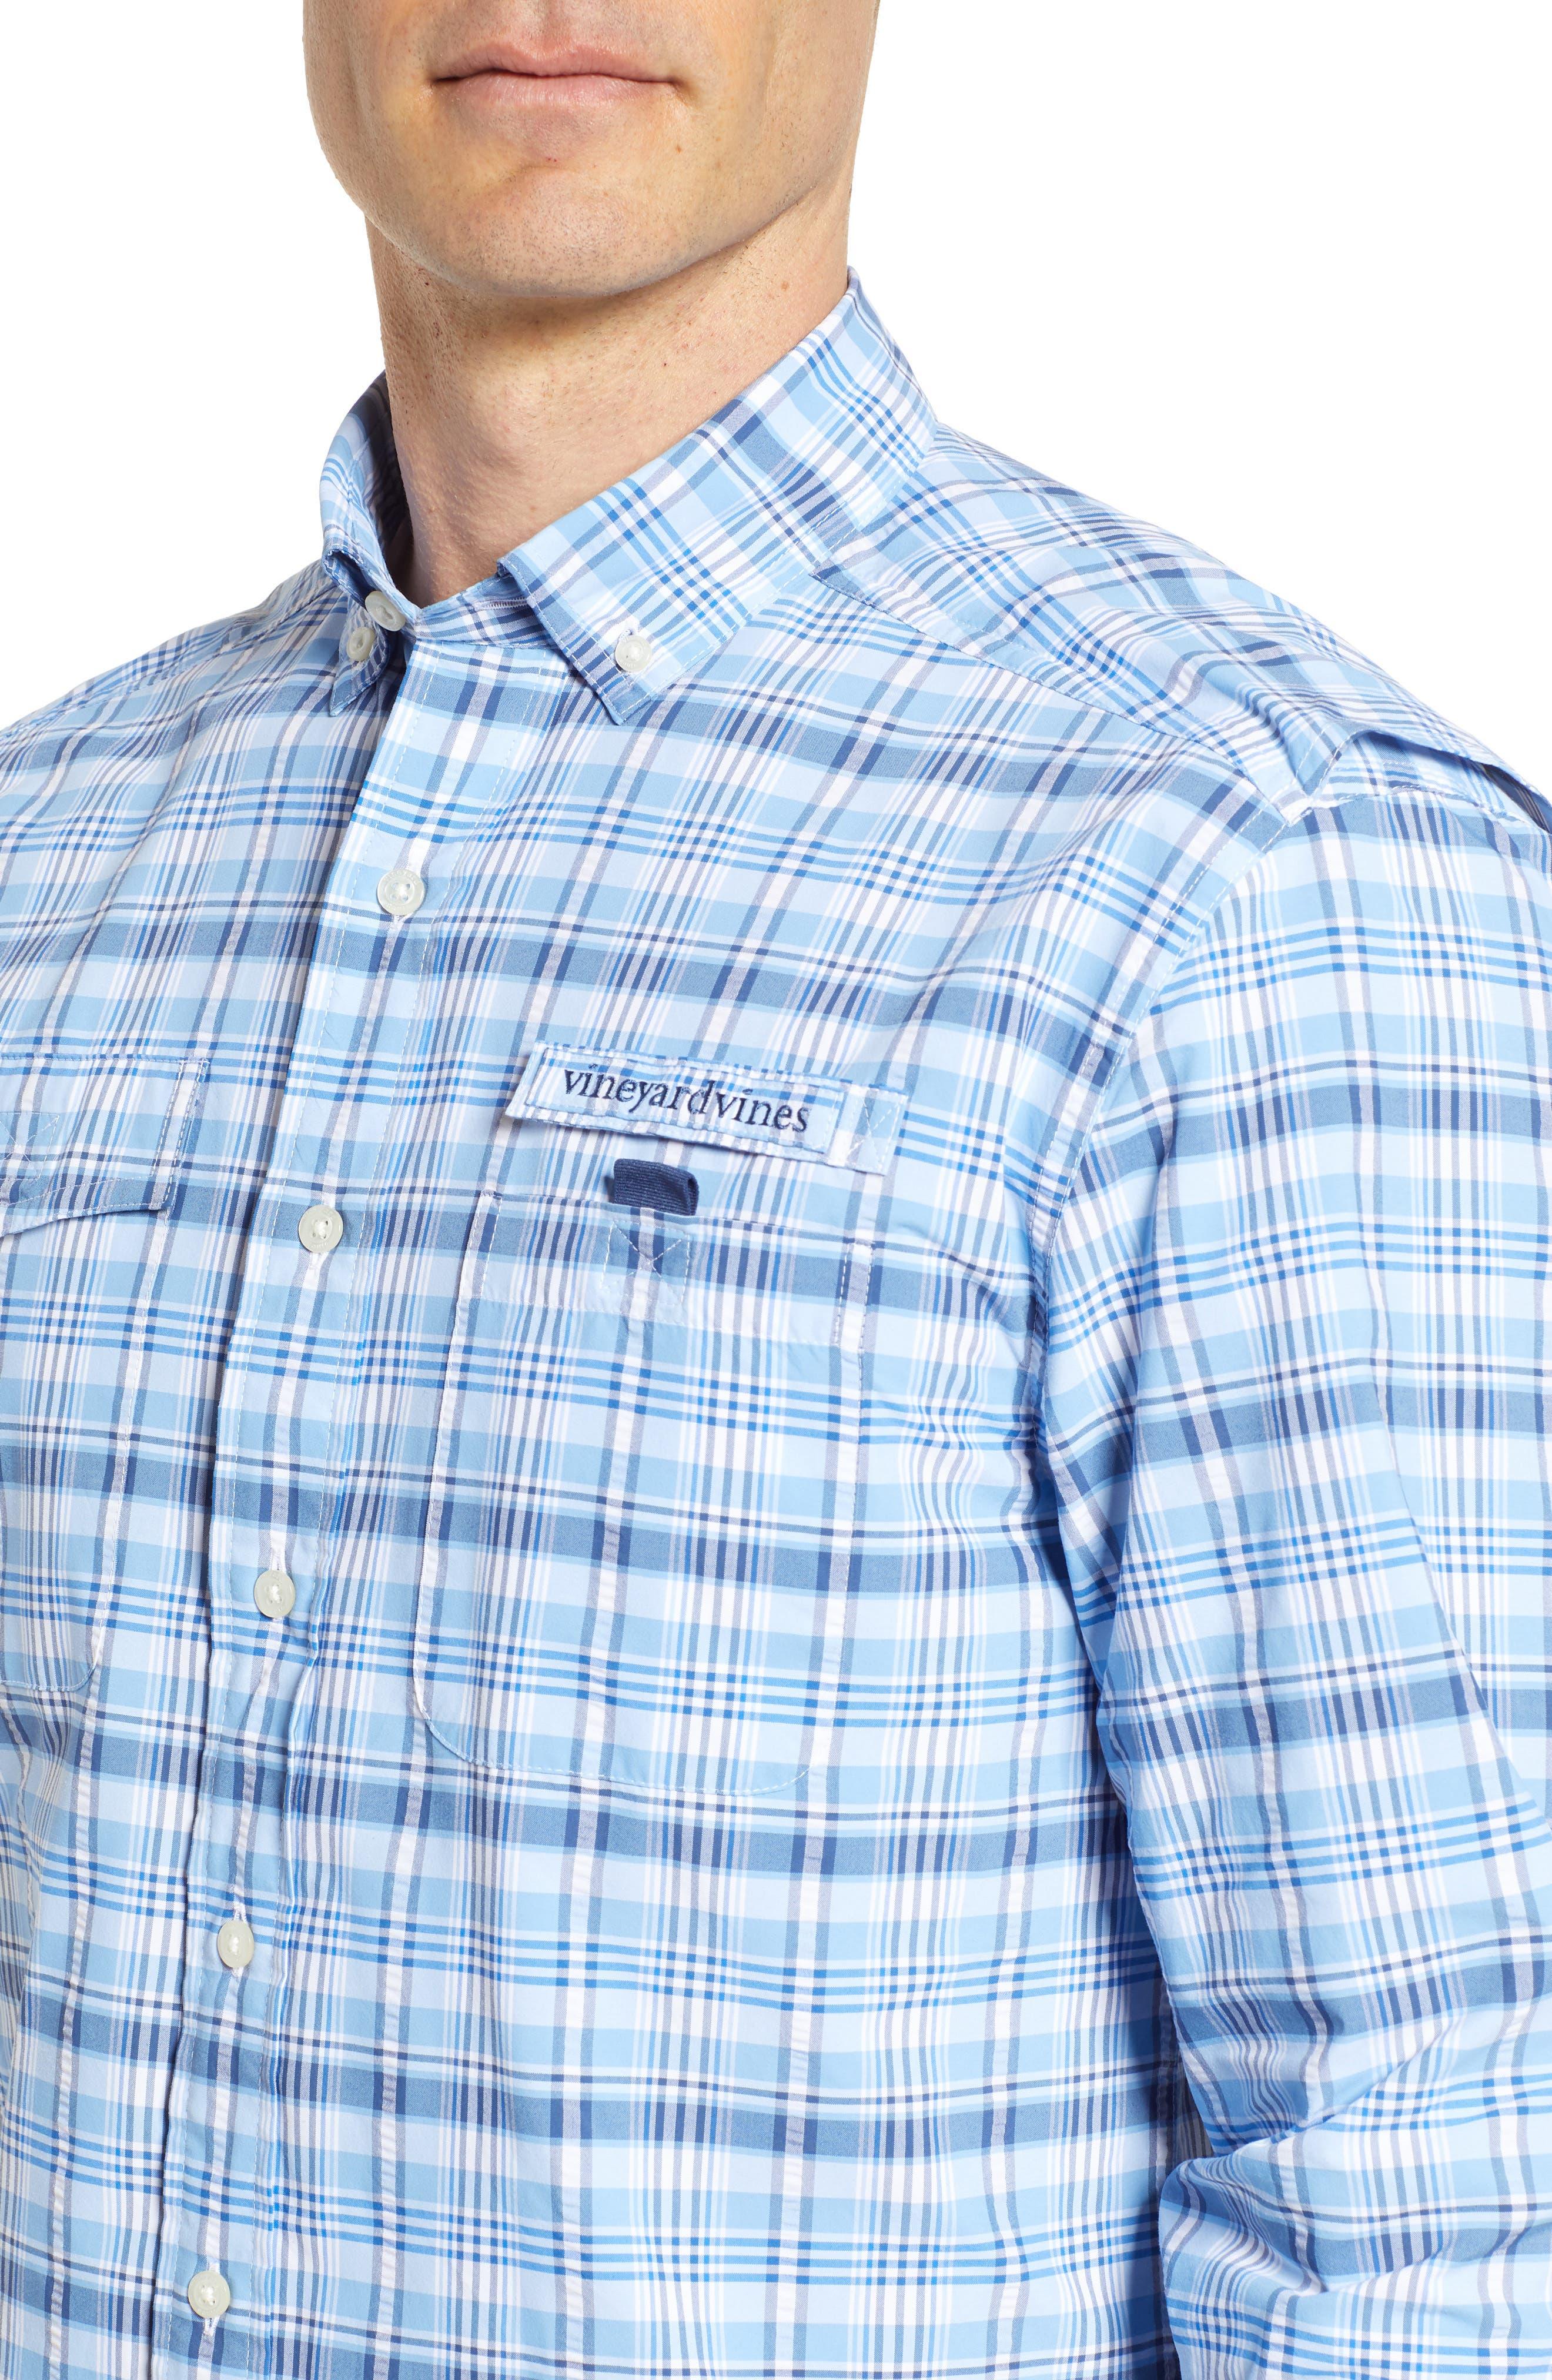 Prospect Hill Harbor Regular Fit Plaid Performance Sport Shirt,                             Alternate thumbnail 2, color,                             Ocean Breeze